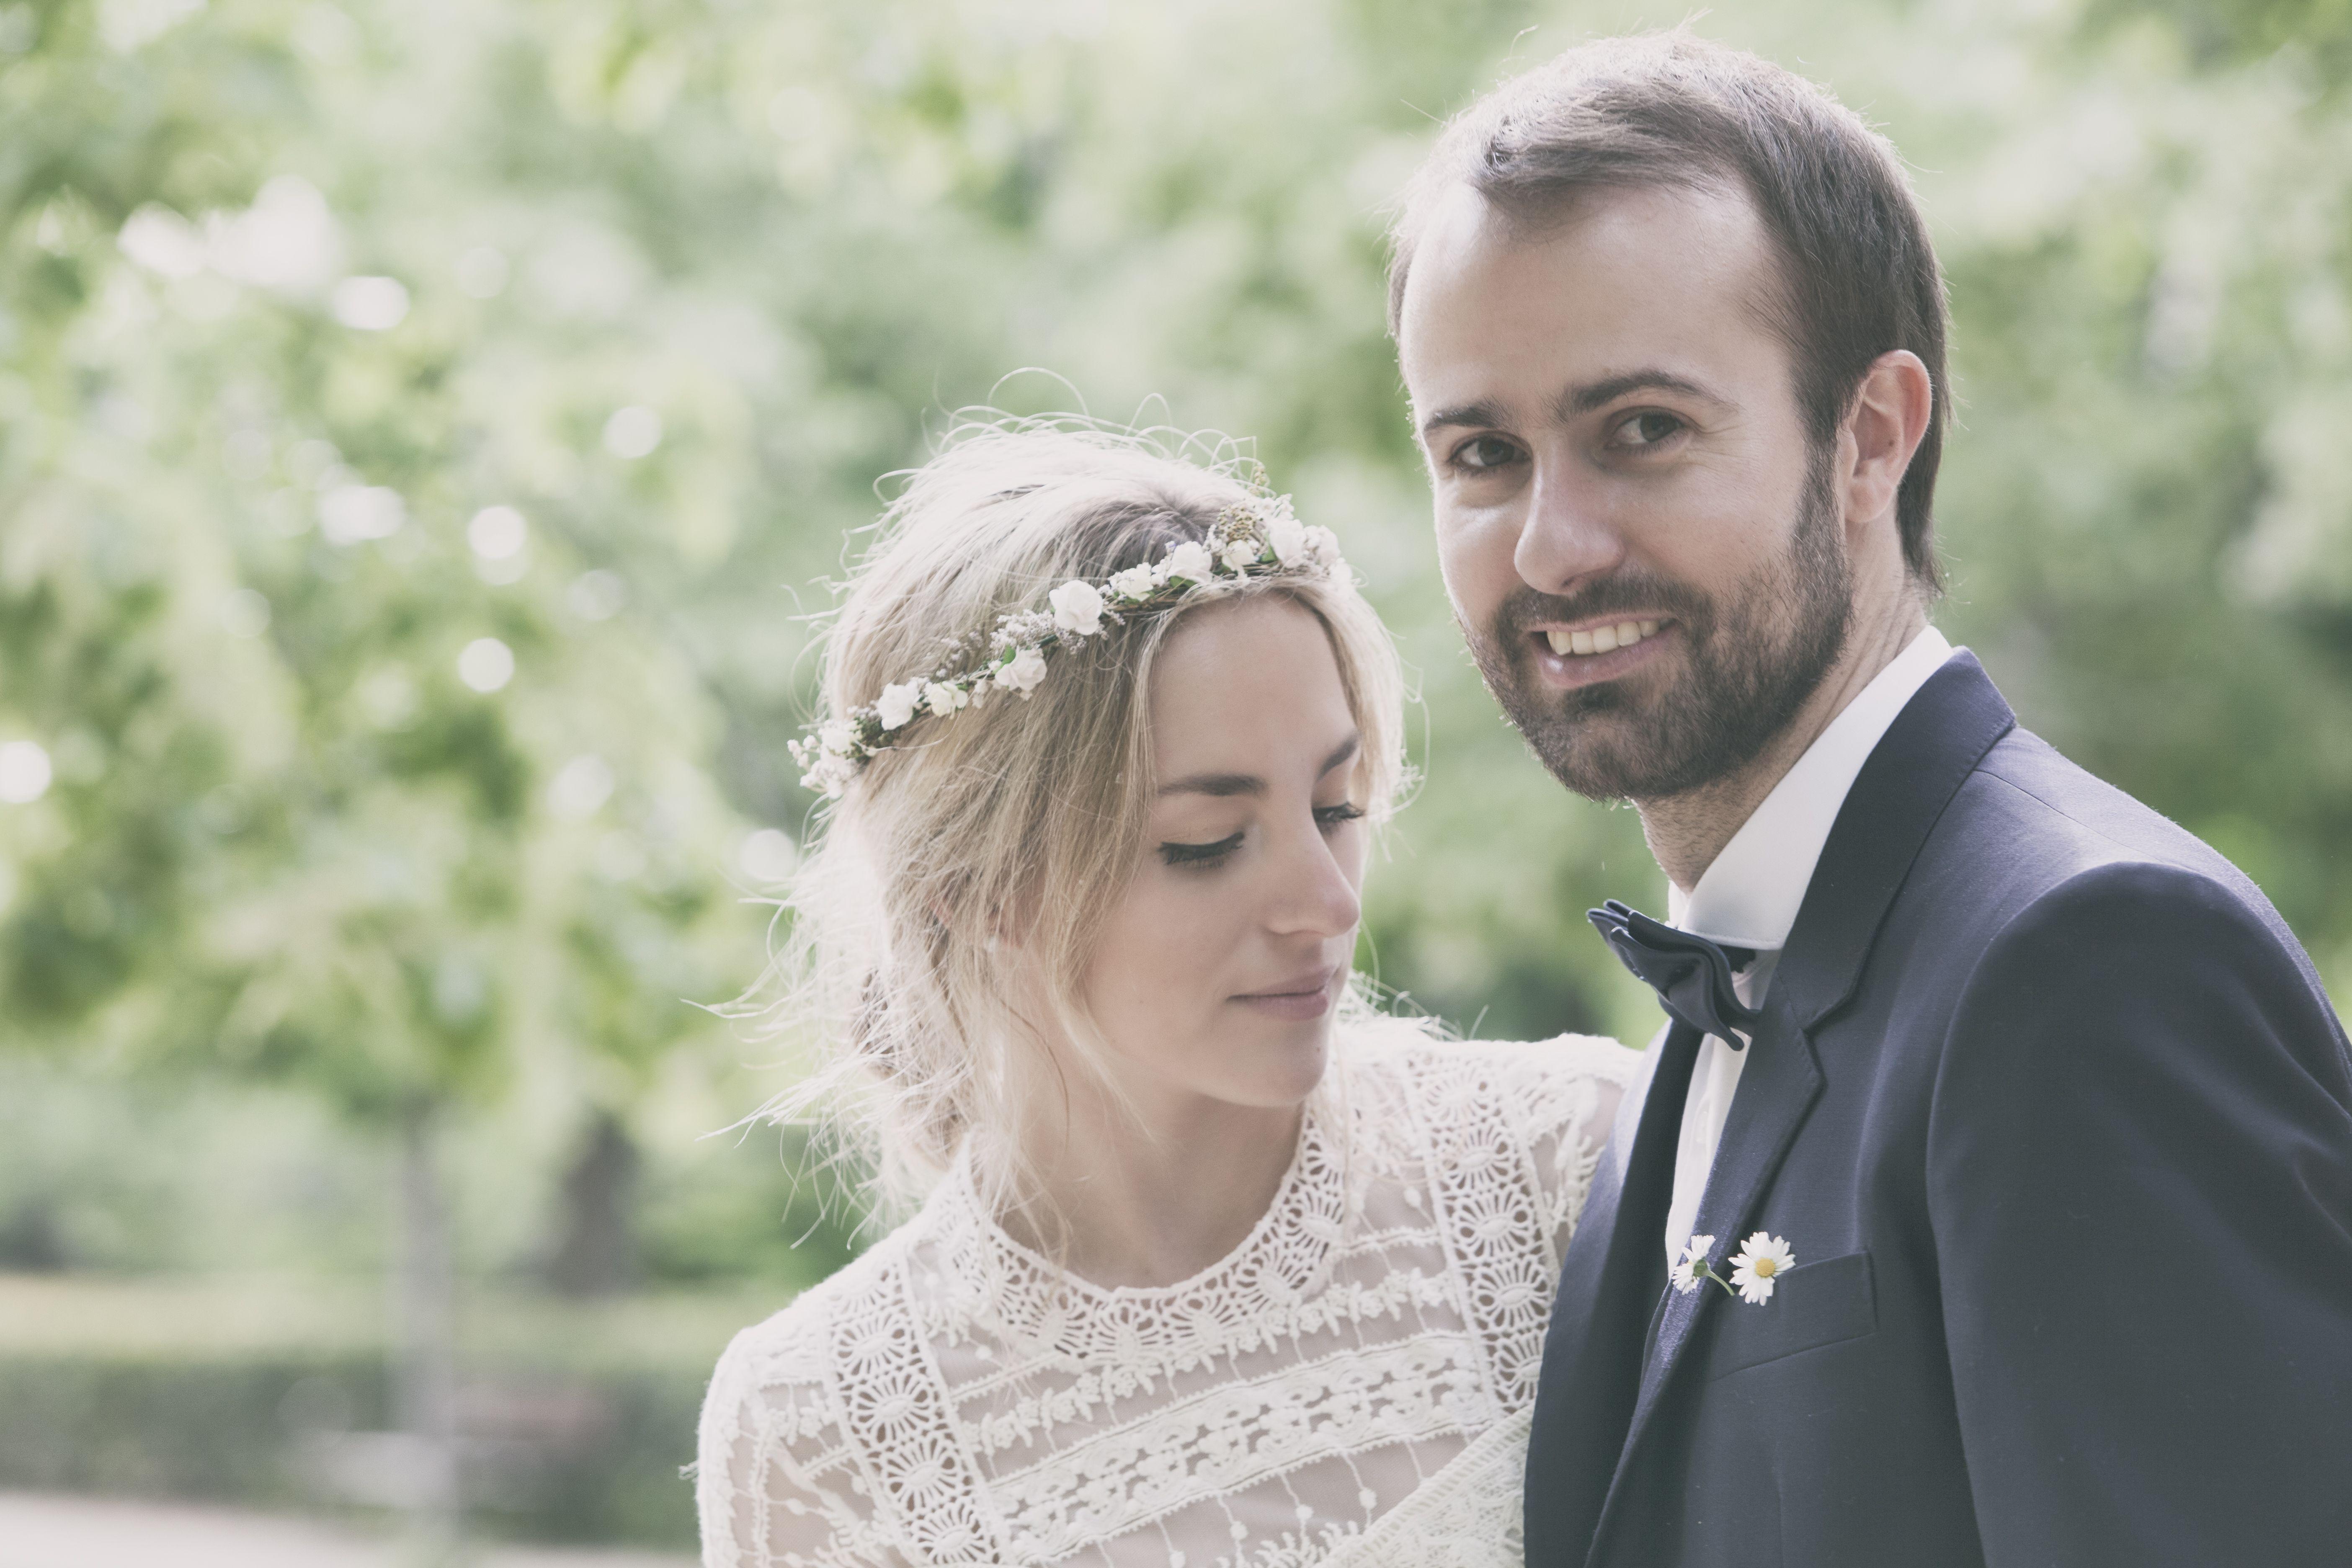 Julia Livellara Abrile casamiento Madrid 29 04 2016